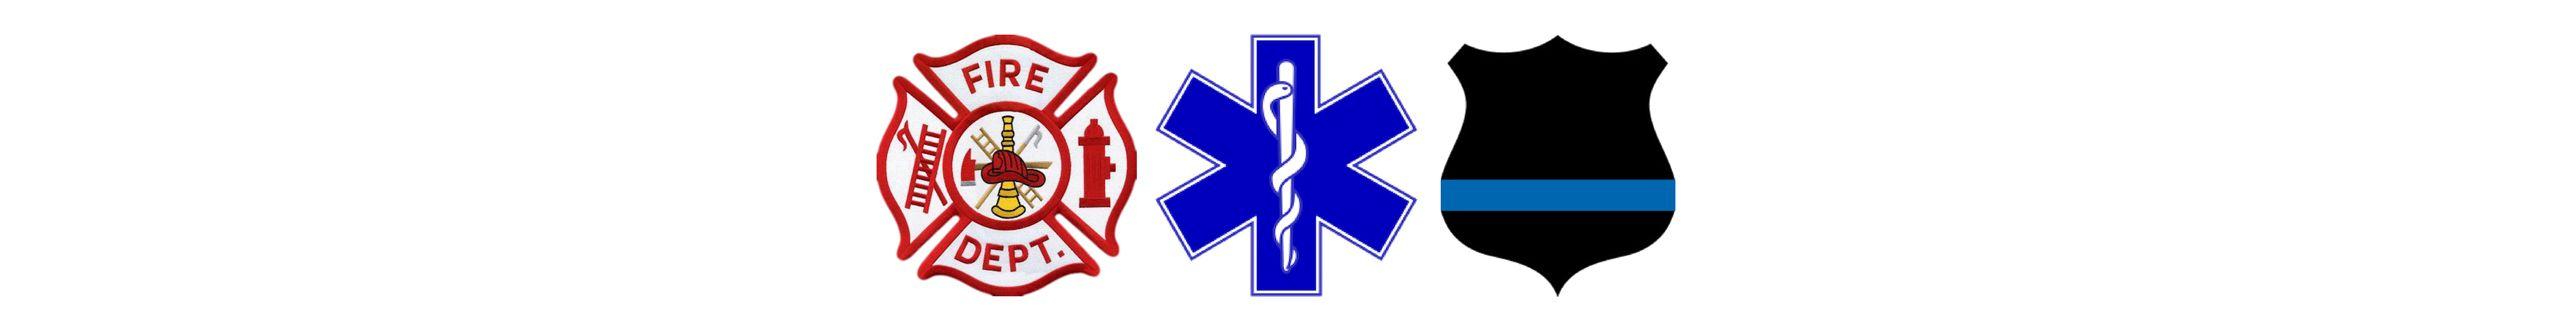 first-responders-header